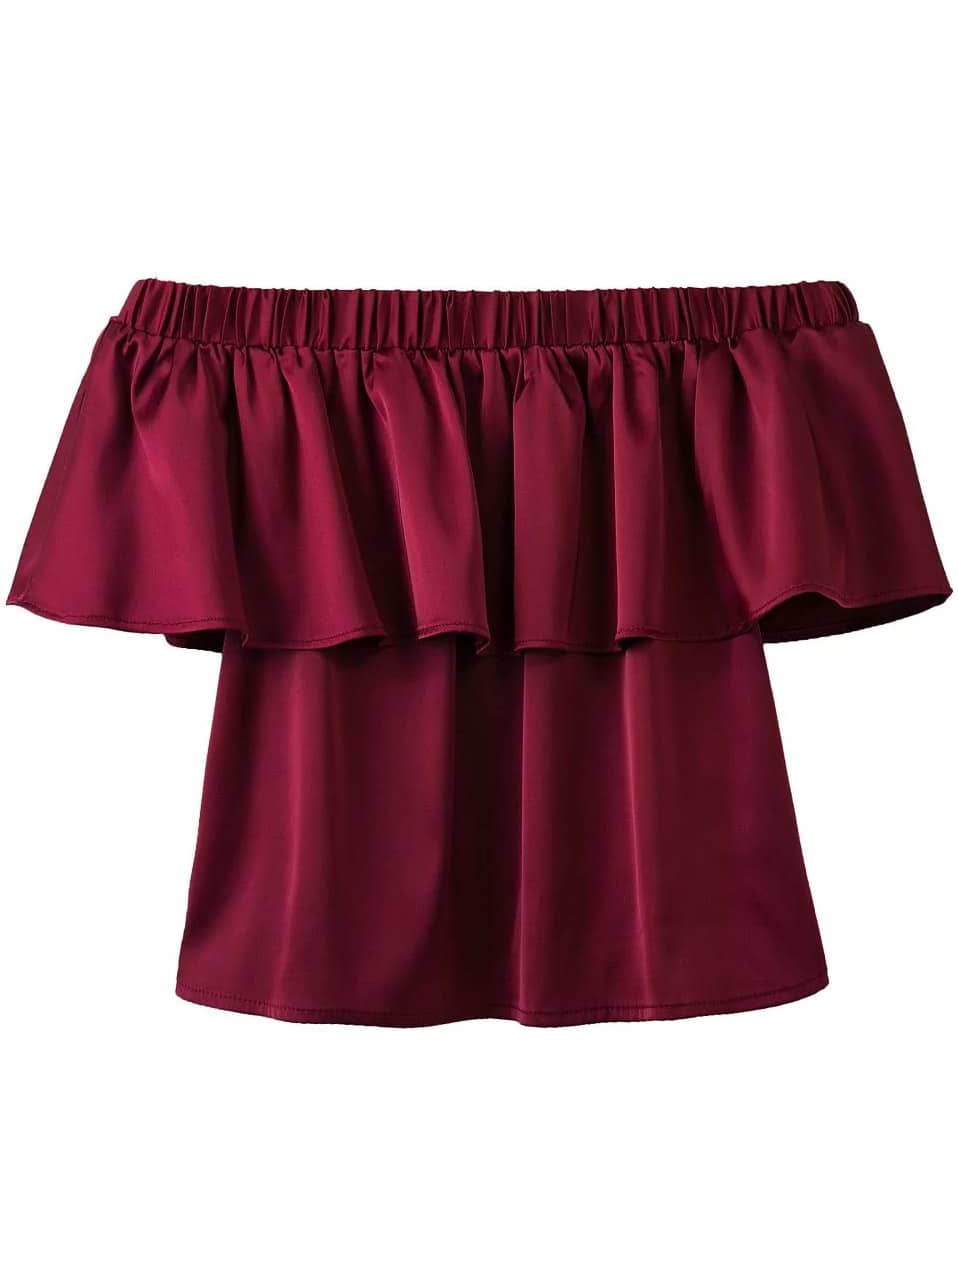 blouse161202202_2